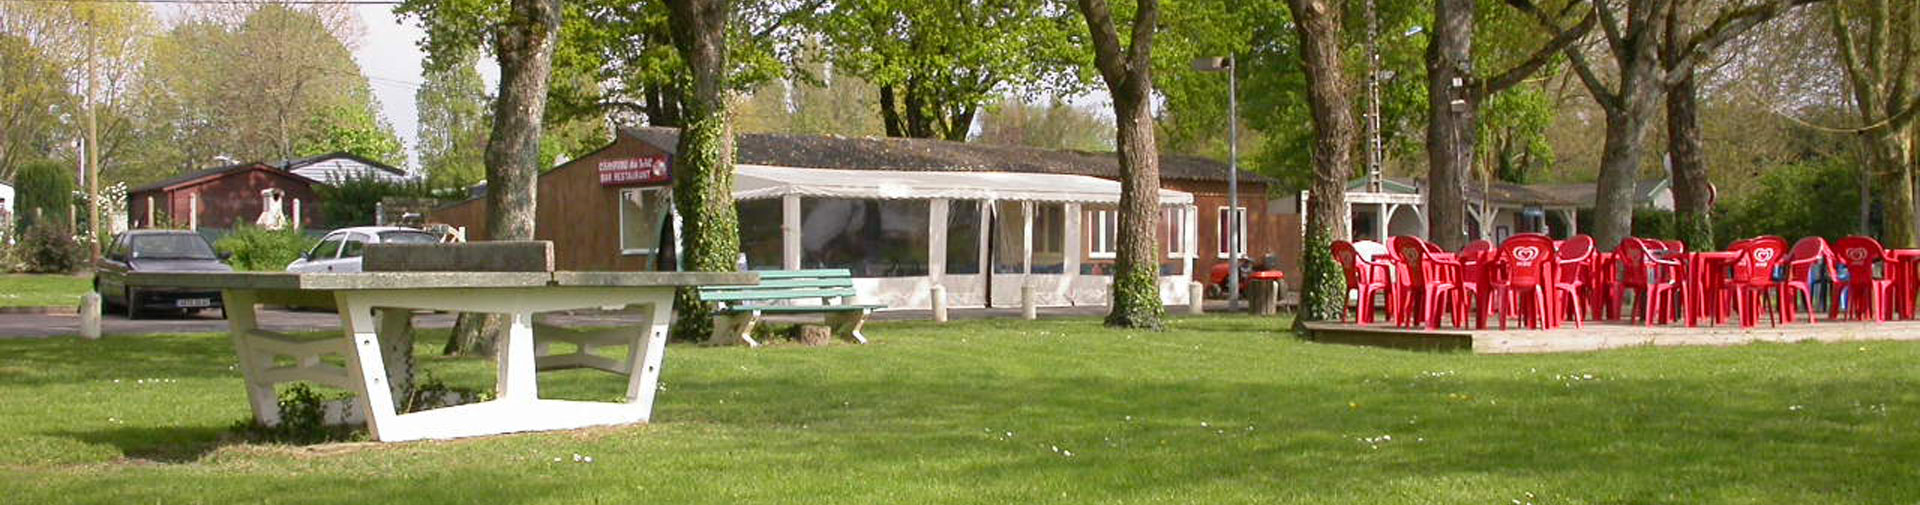 service camping du lac bain de bretagne